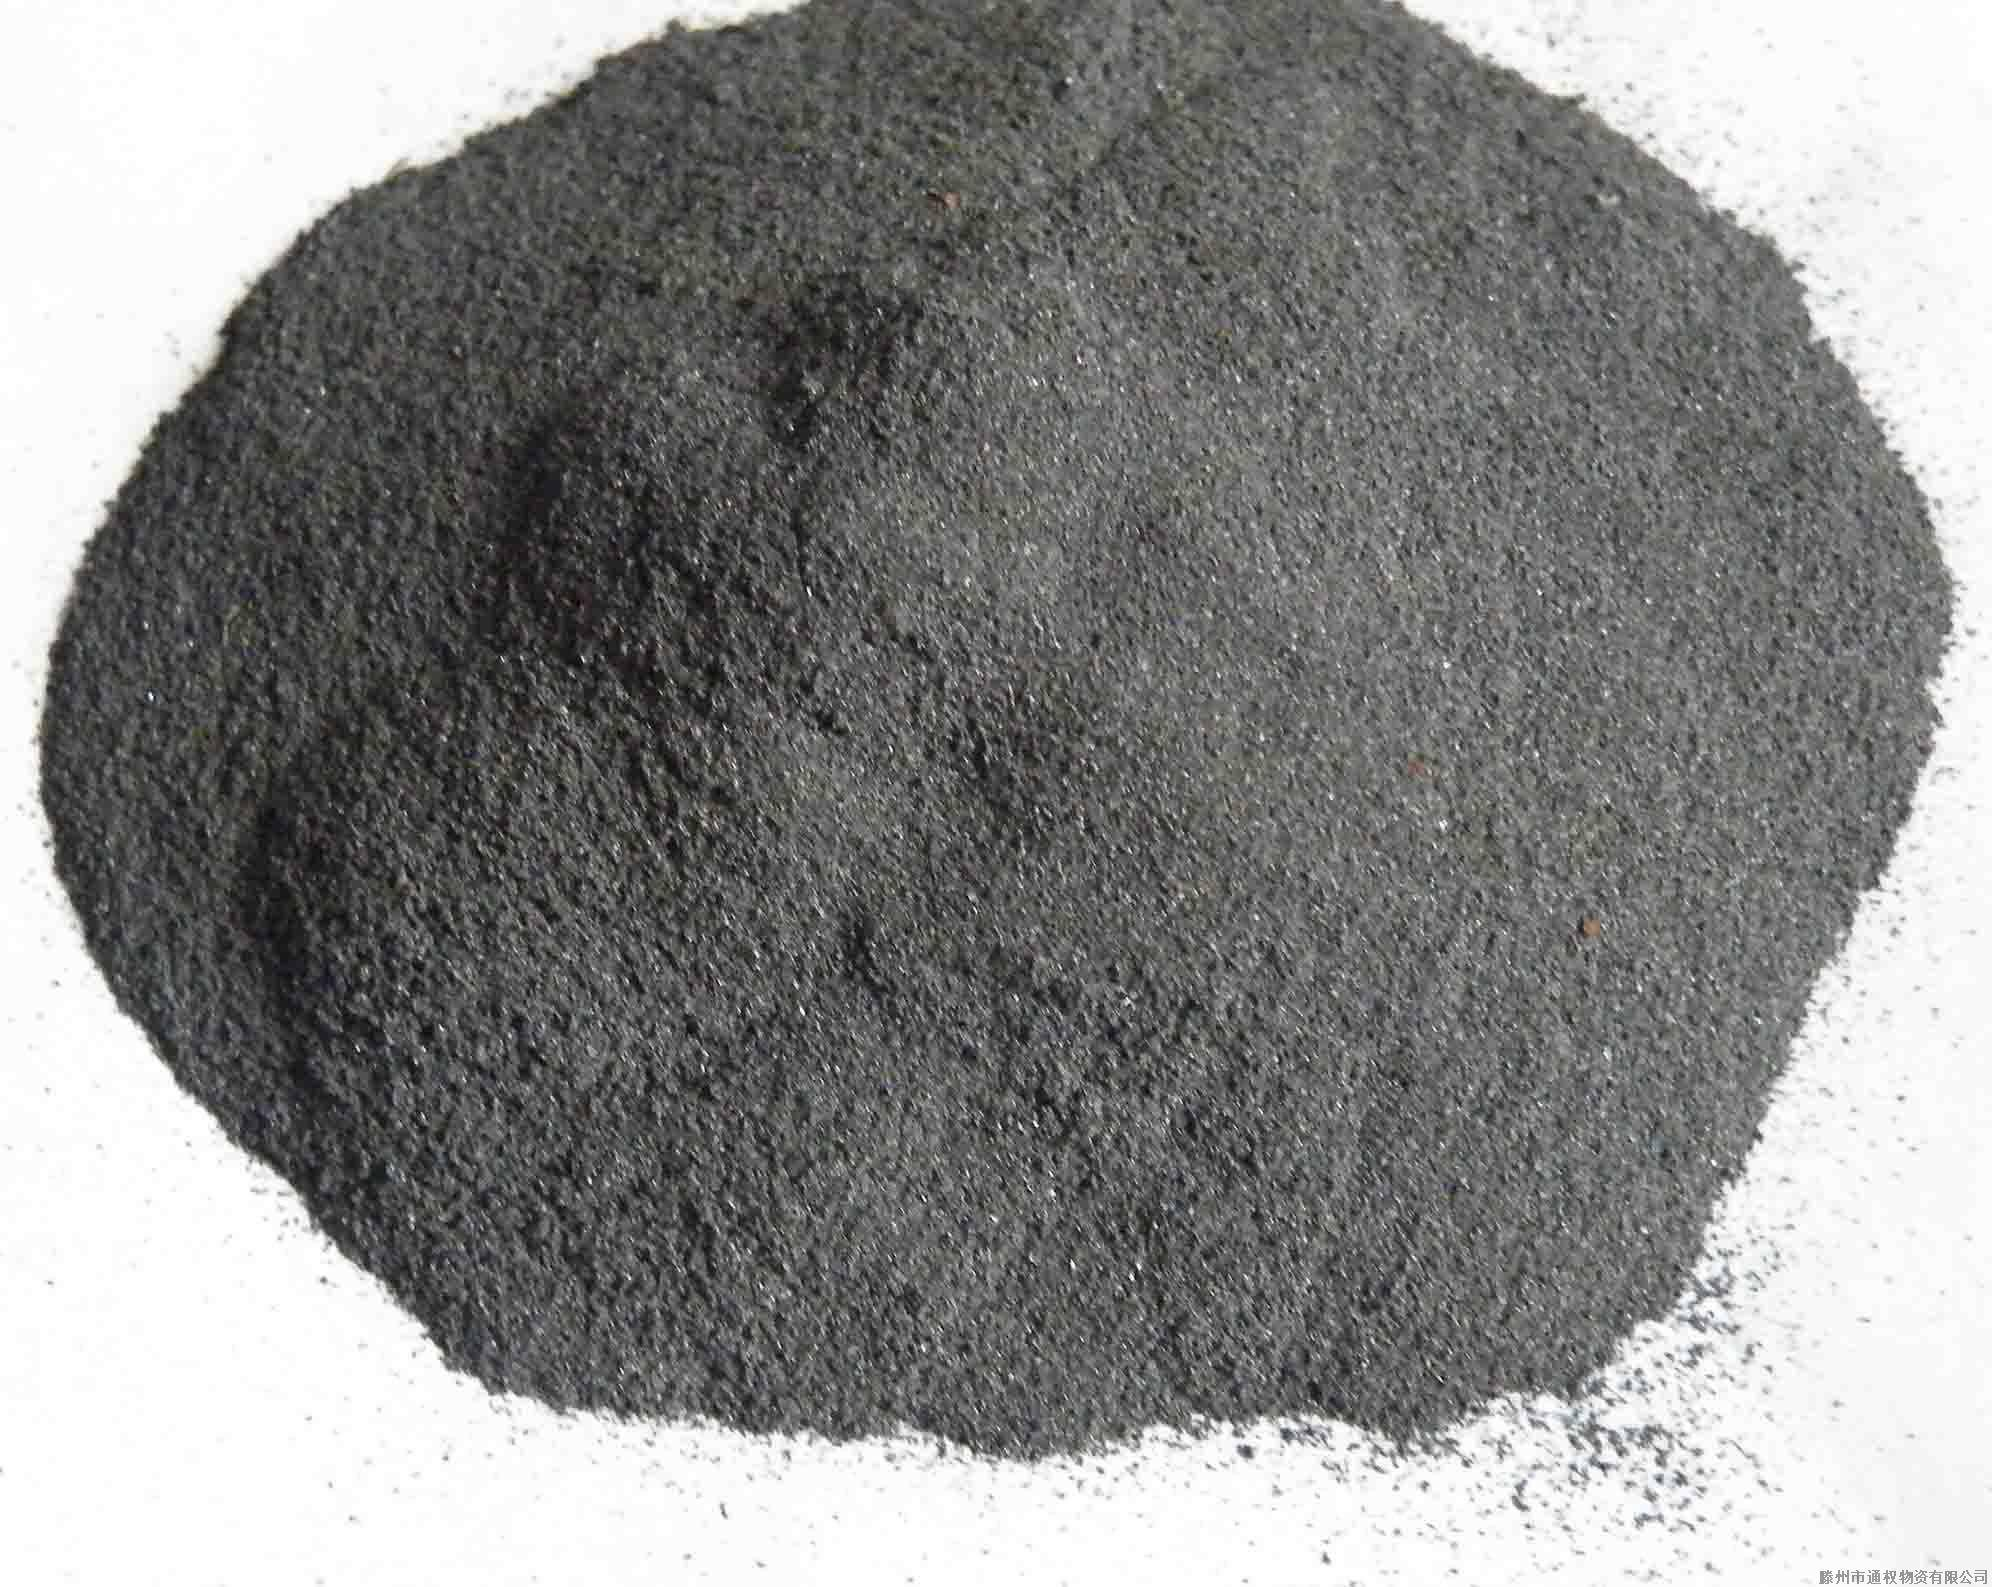 reduced iron powder 200 mesh,300 mesh